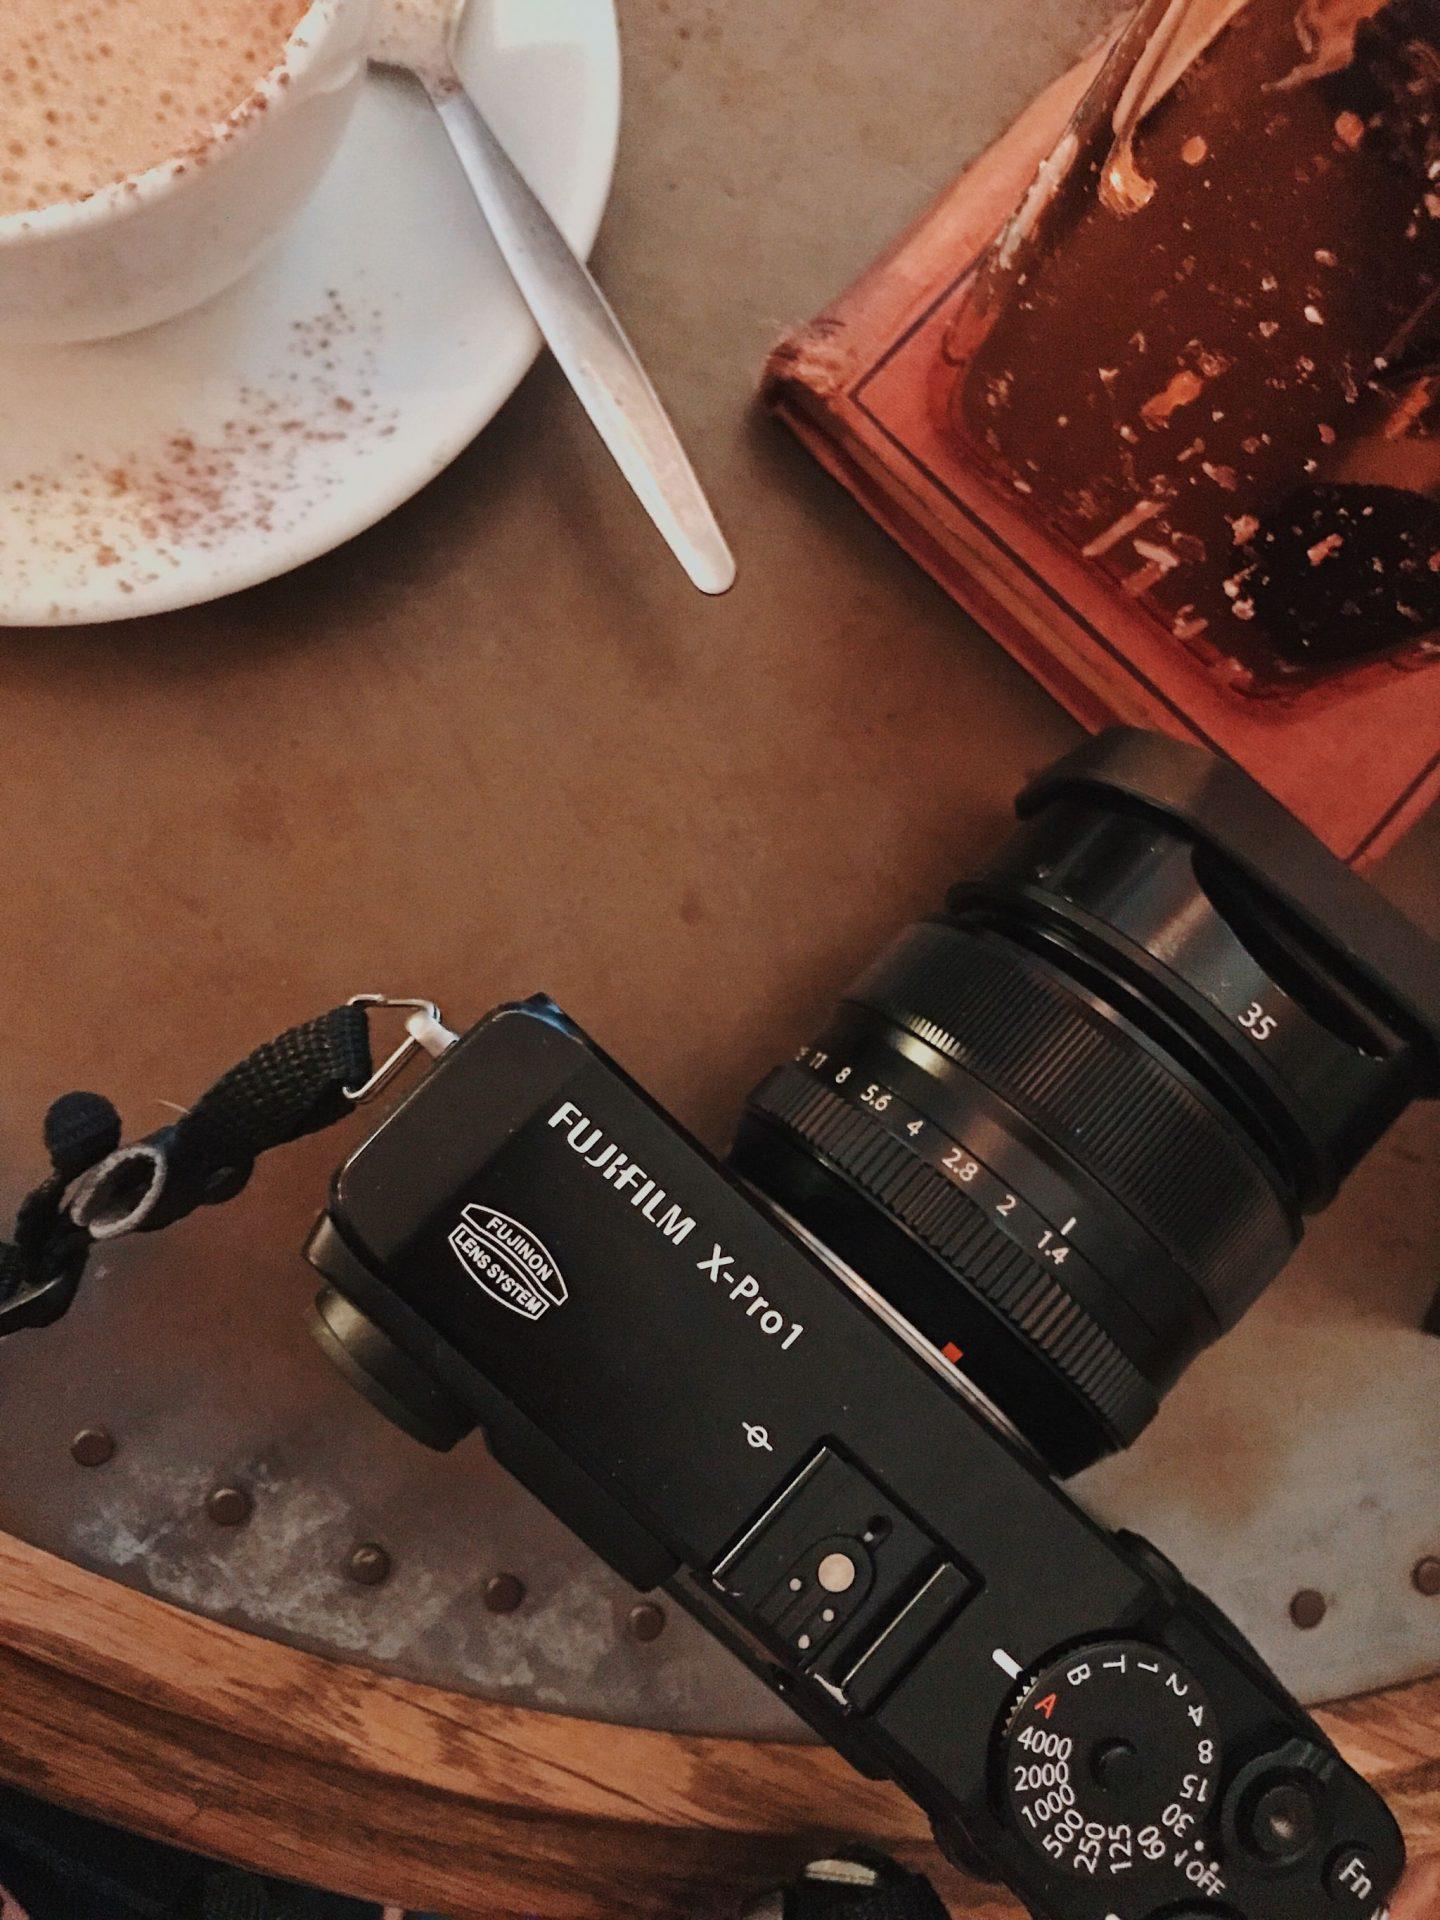 Flatlay, Fuji X Pro 1, Bookcafe Derby, Katie Writes, Fujifilm X-Pro 1, Fuji camera for bloggers, ©Katiewrites.co.uk